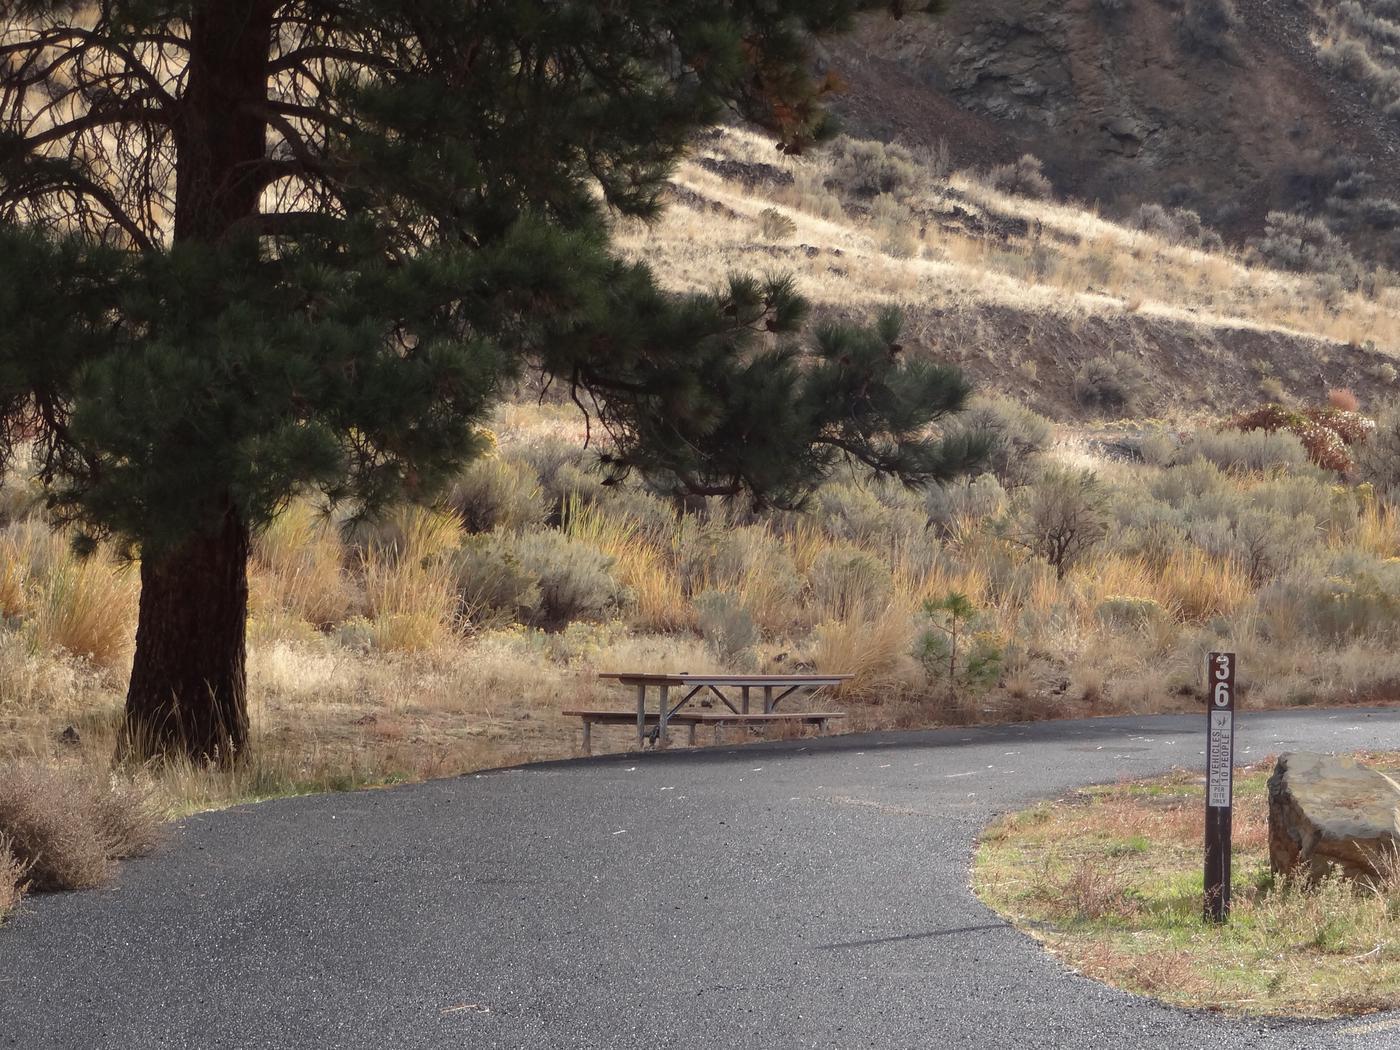 Parking pad, picnic table at Big Pines campsite #36.Big Pines campsite #36